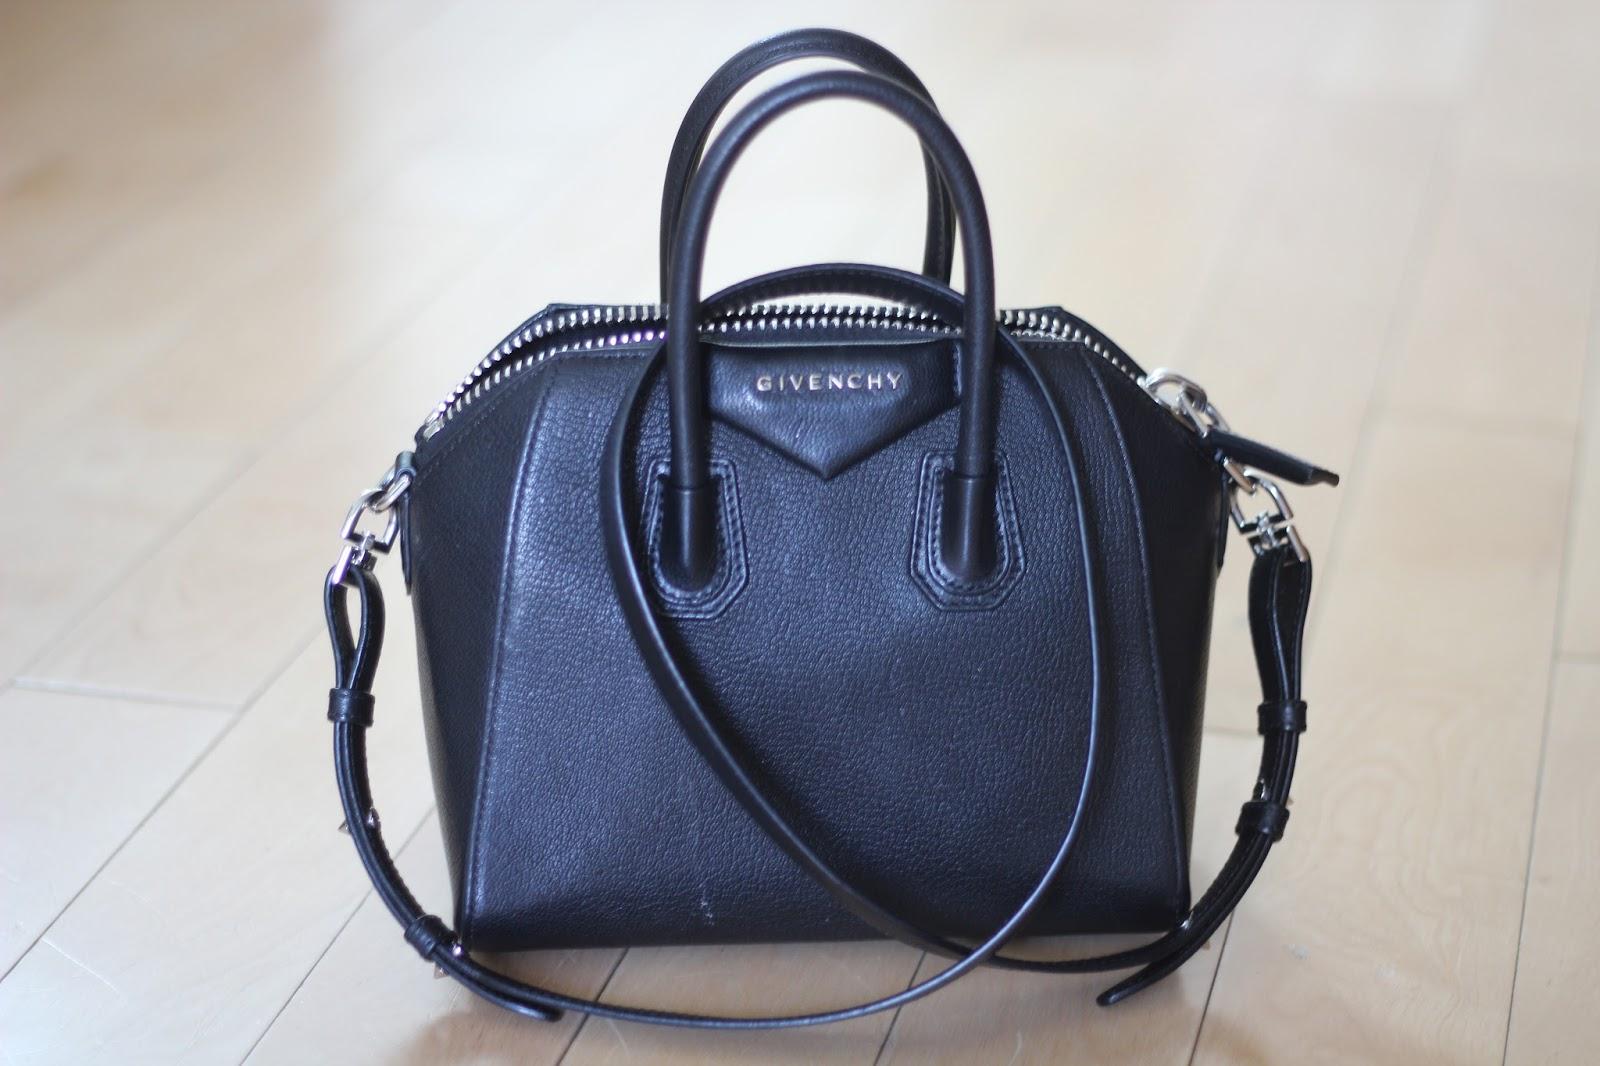 cdbbb0a75645 Givenchy Mini Antigona Review